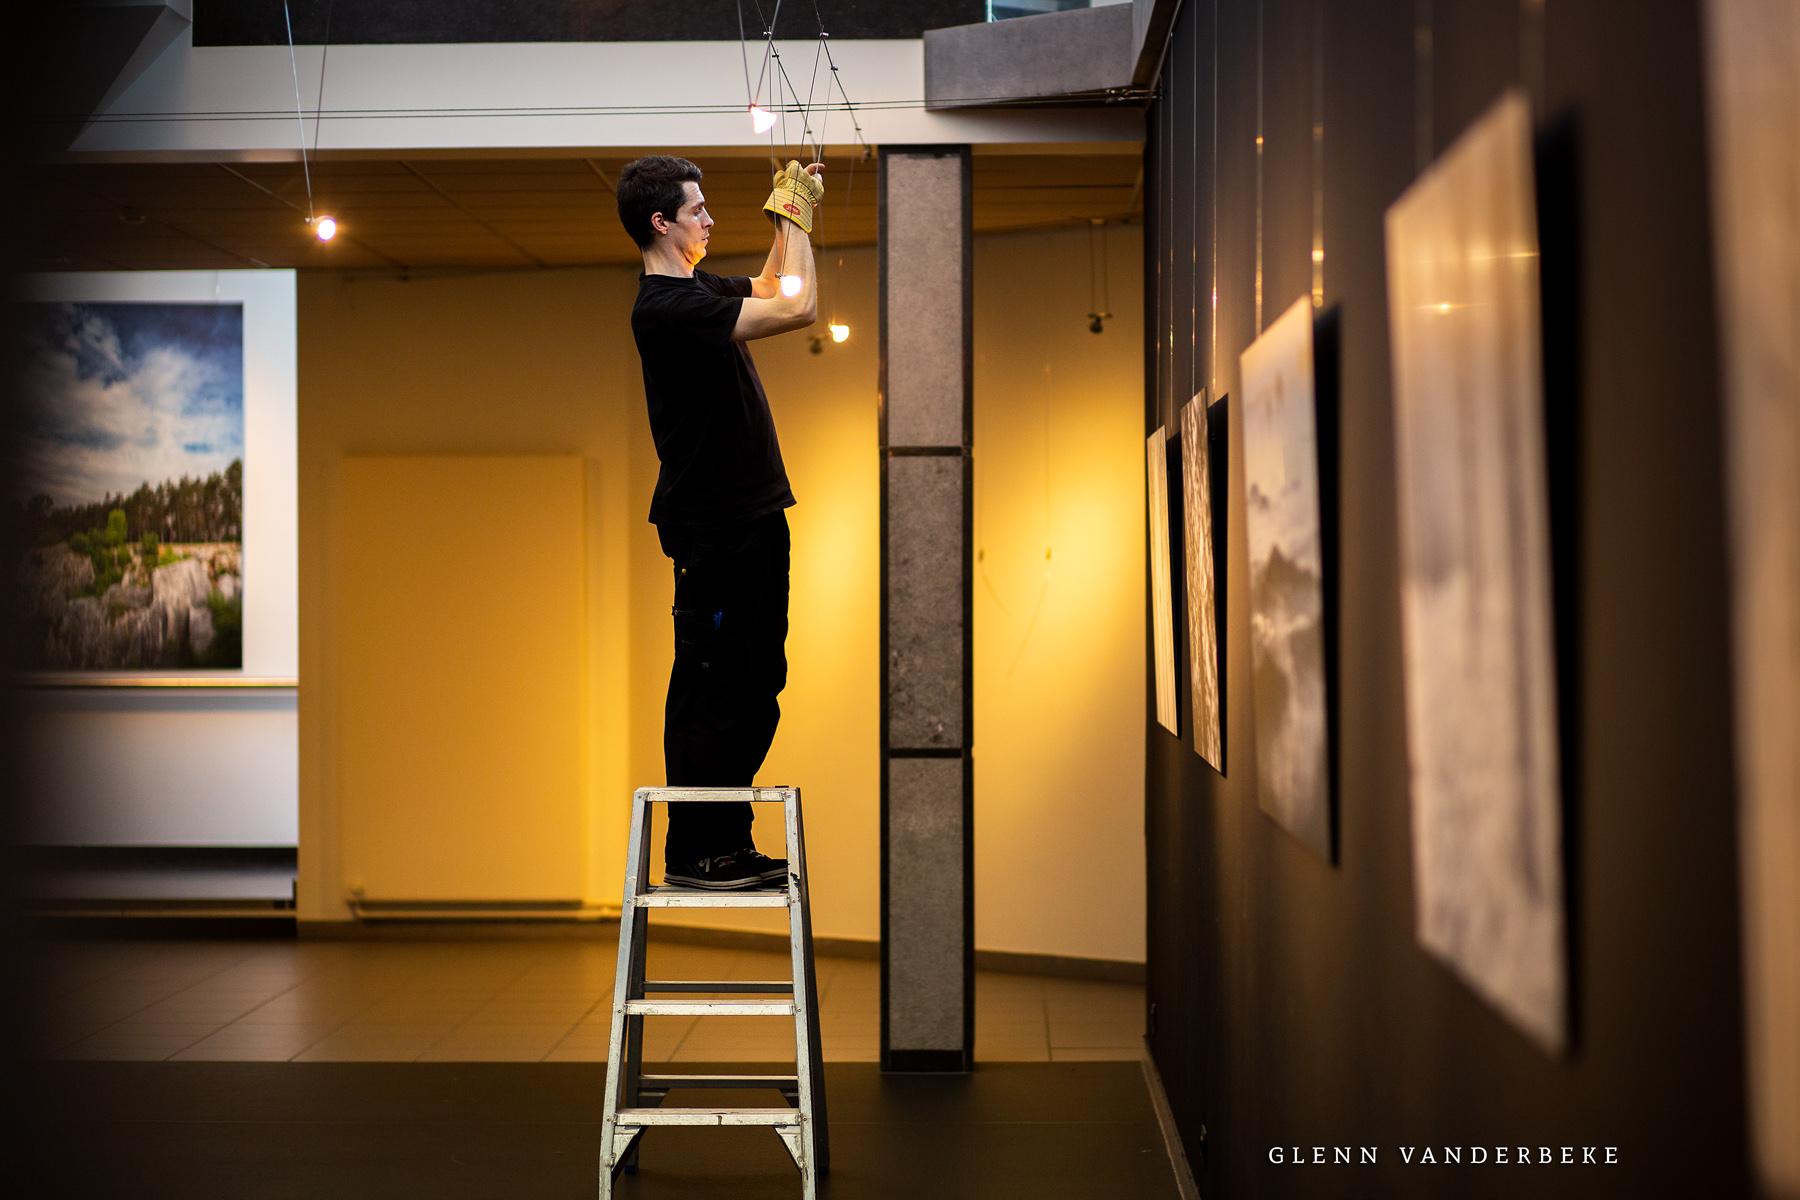 glenn vanderbeke, landscahpsfotografie, landschapsfotograaf, West-Vlaamse fotograaf, tentoonstelling, tentoonstelling Glenn Vanderbeke, tentoonstelling cc de brouckere, exposition glenn vanderbeke